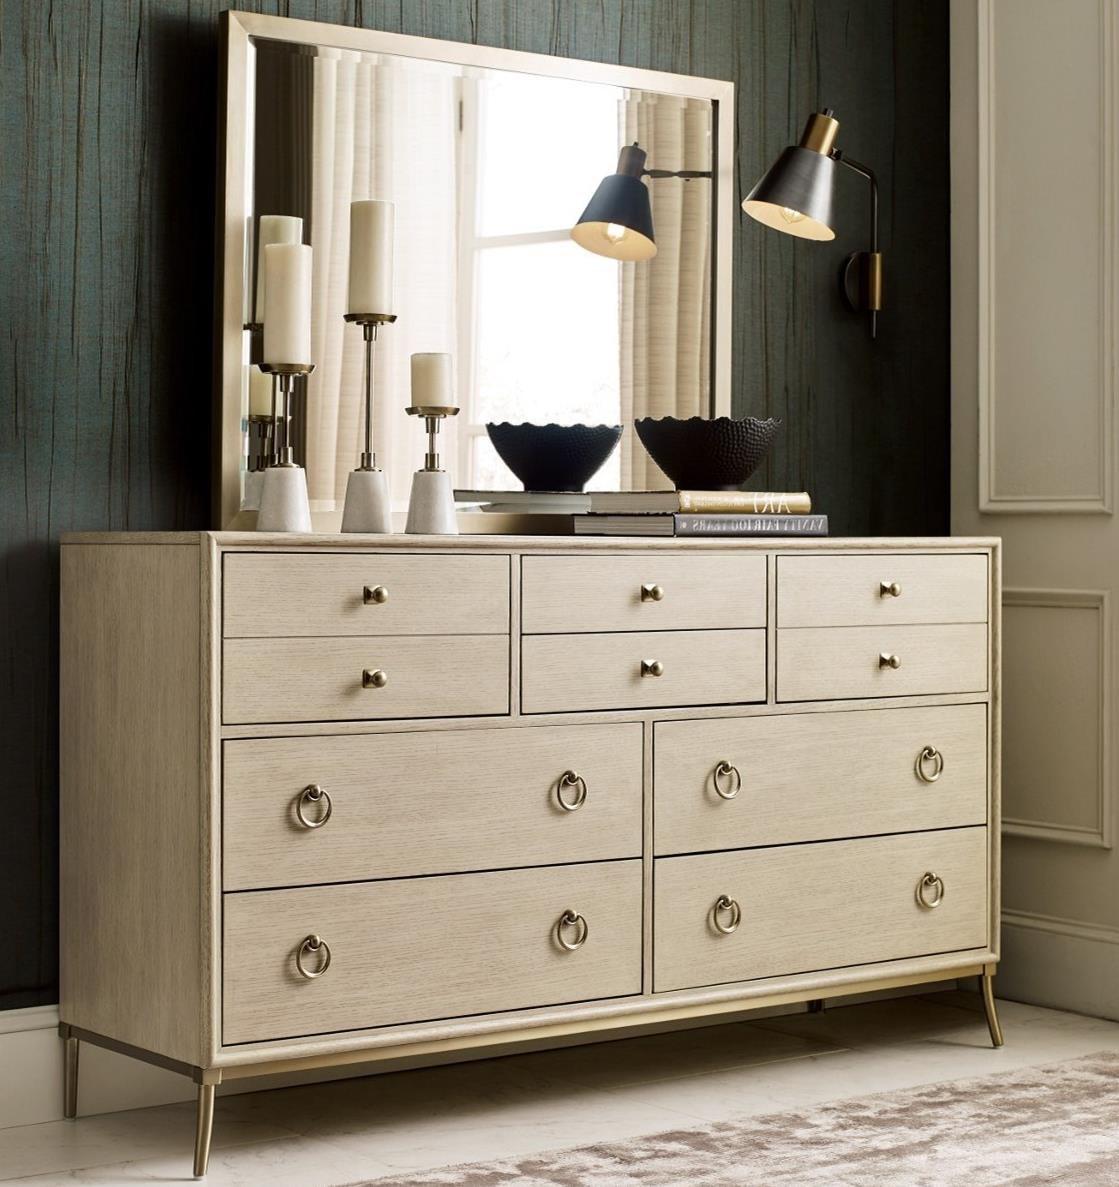 Lenox Dresser + Mirror Set by American Drew at Stoney Creek Furniture